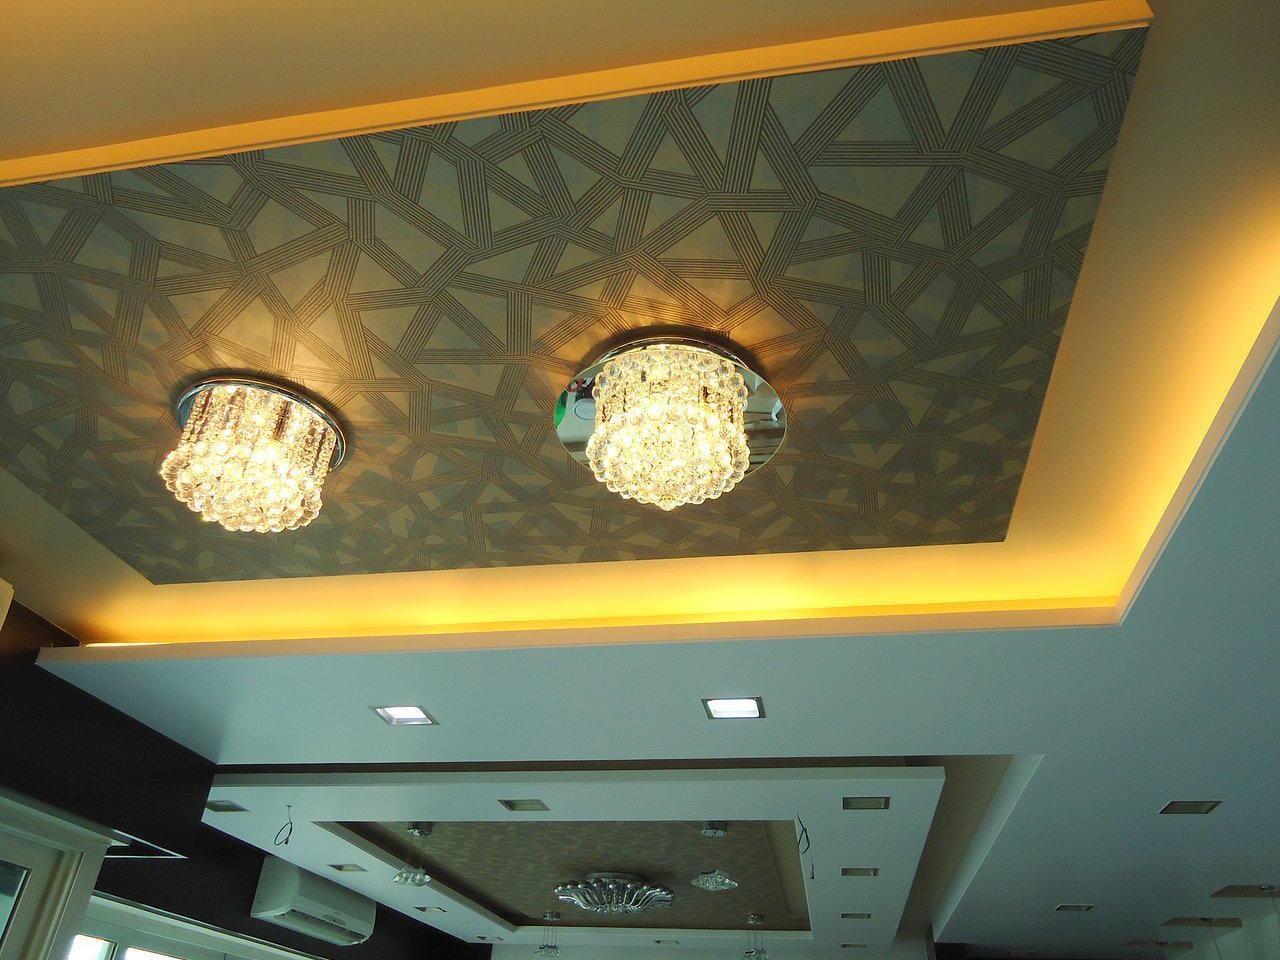 False Ceiling With Chandelier by Shishu Yadava Living-room Contemporary | Interior Design Photos & Ideas